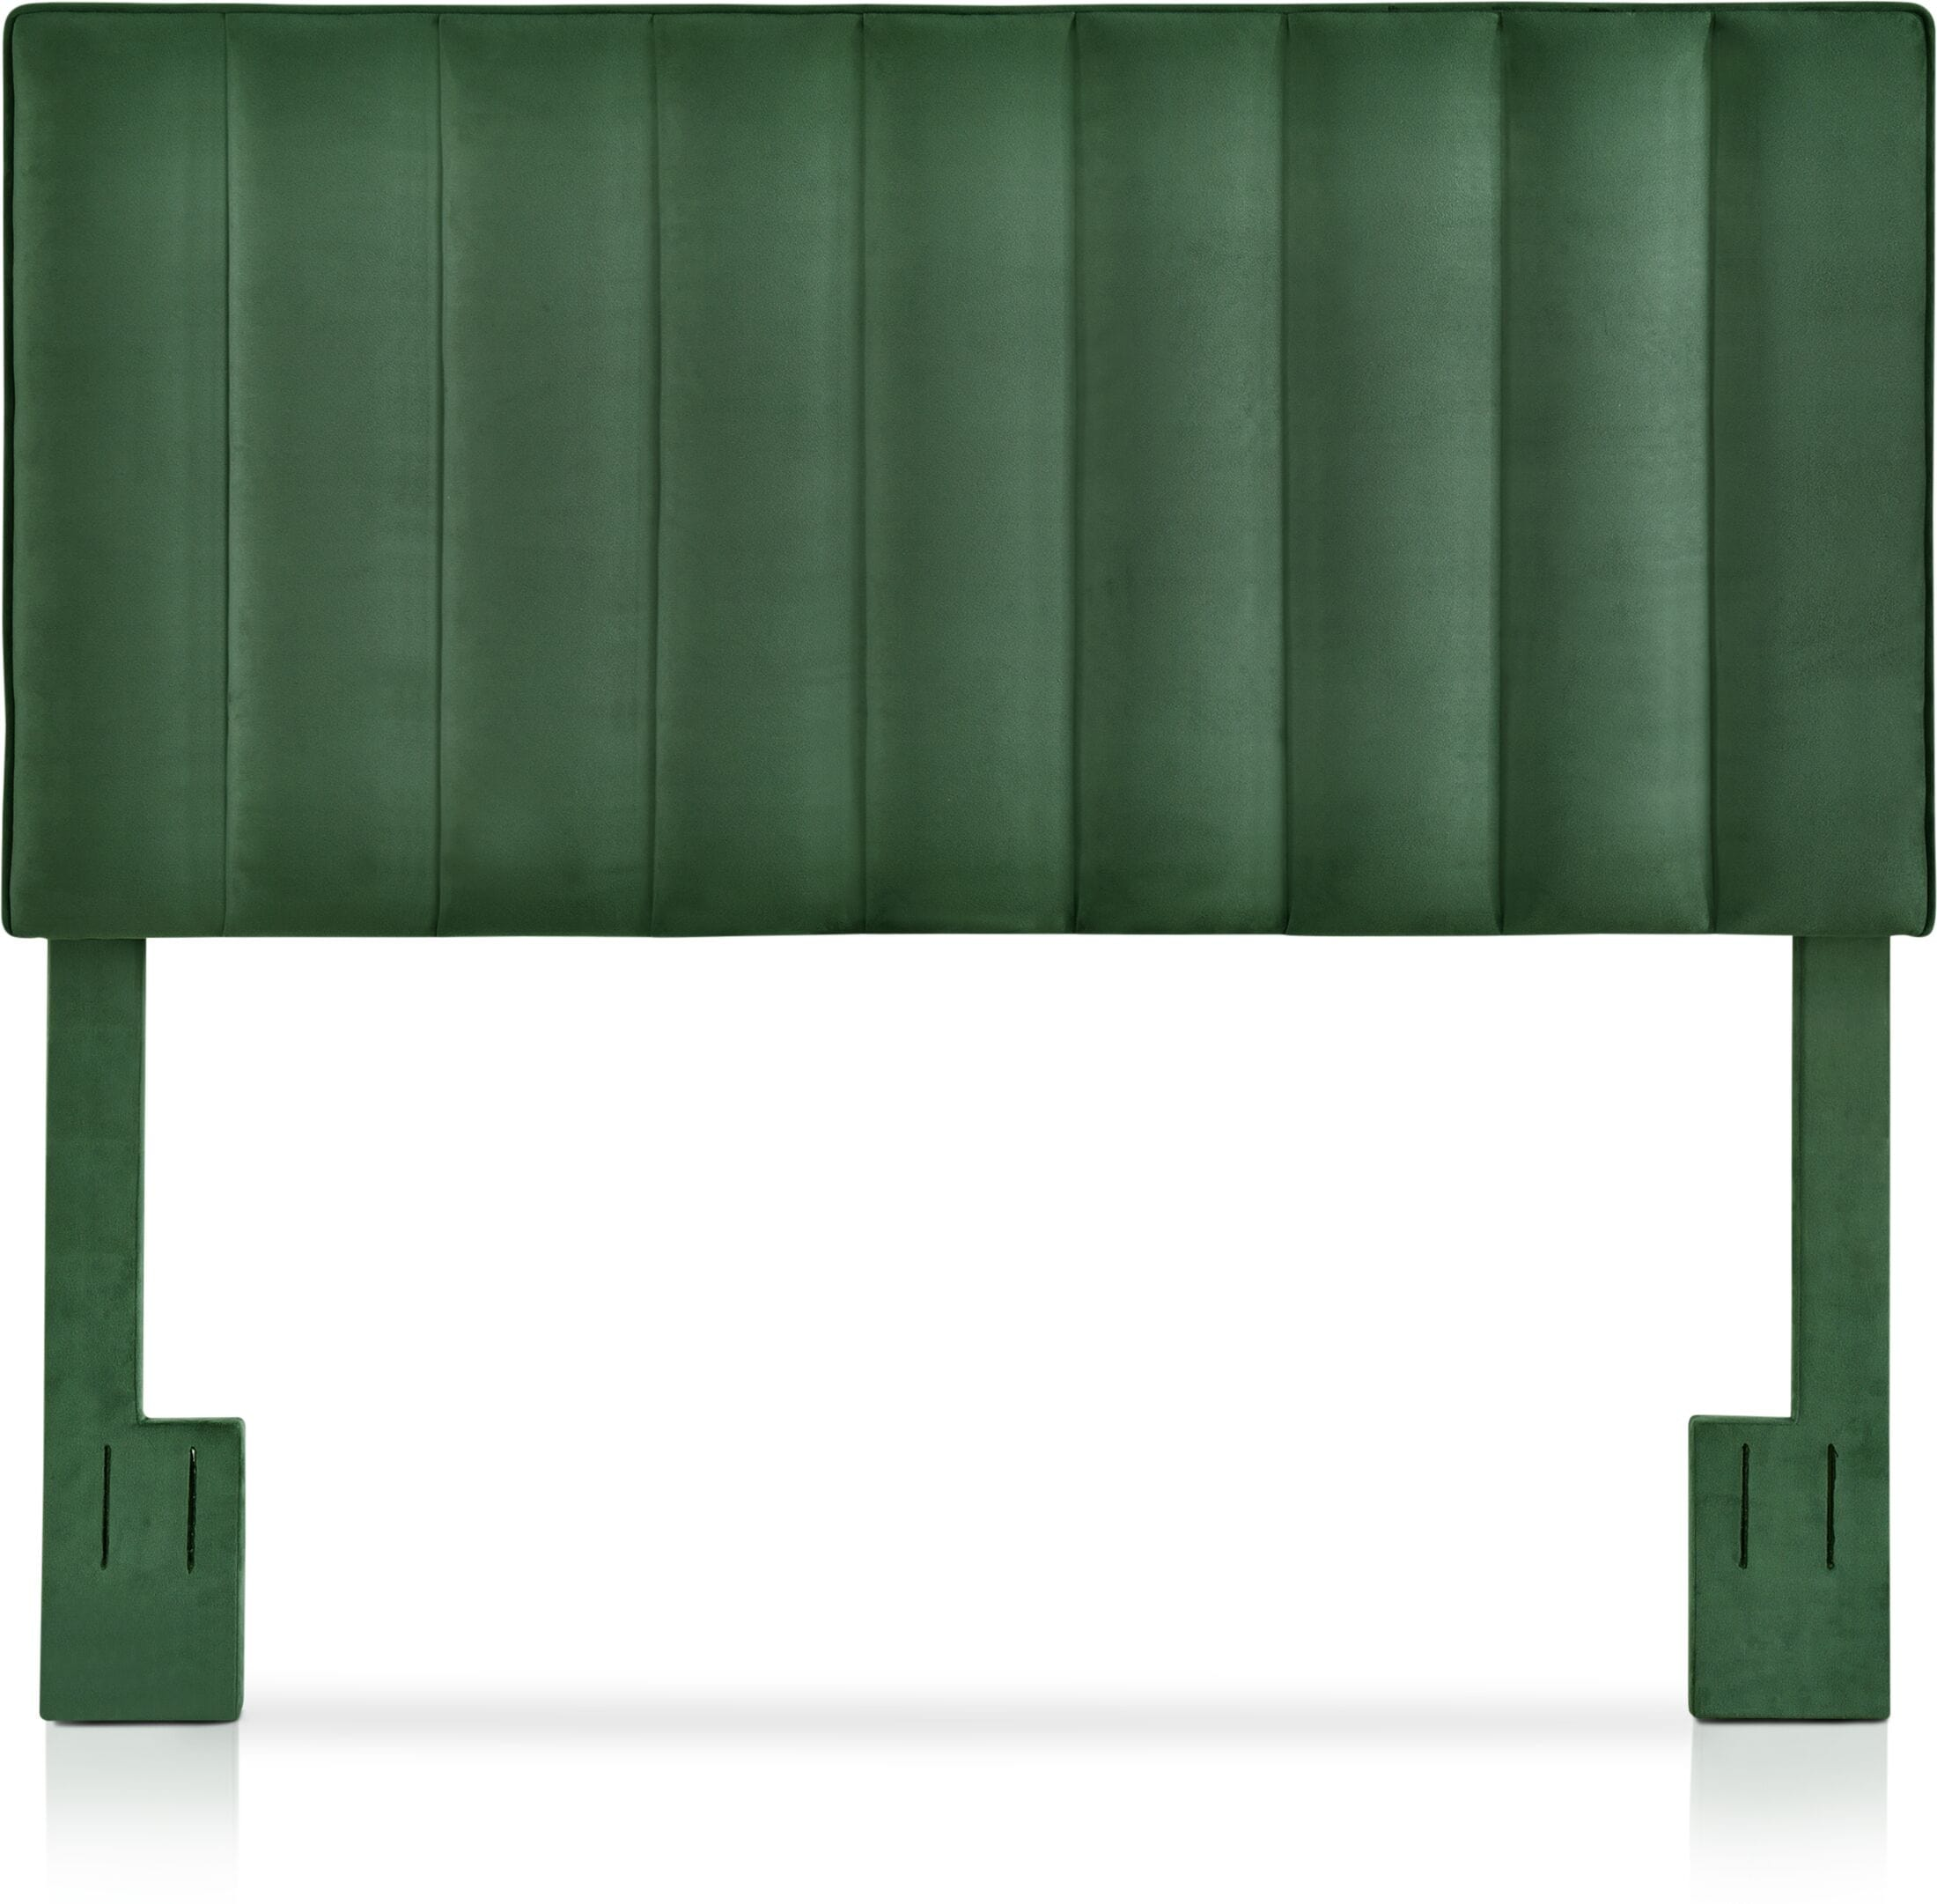 Bedroom Furniture - Esme Upholstered Headboard